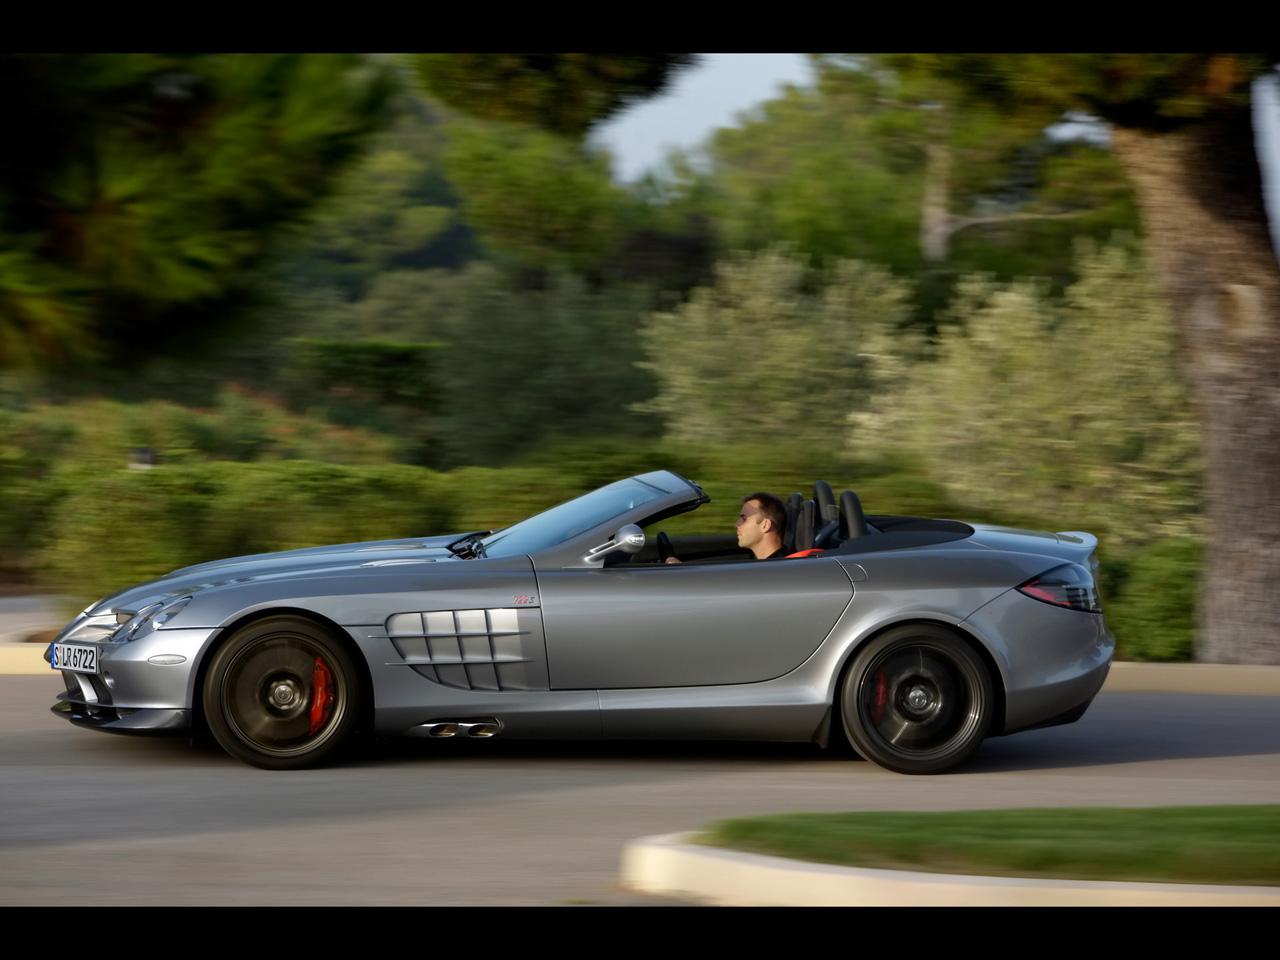 2009-Mercedes-Benz-SLR-McLaren-Roadster-722-S-Side-Speed-1280x960.jpg